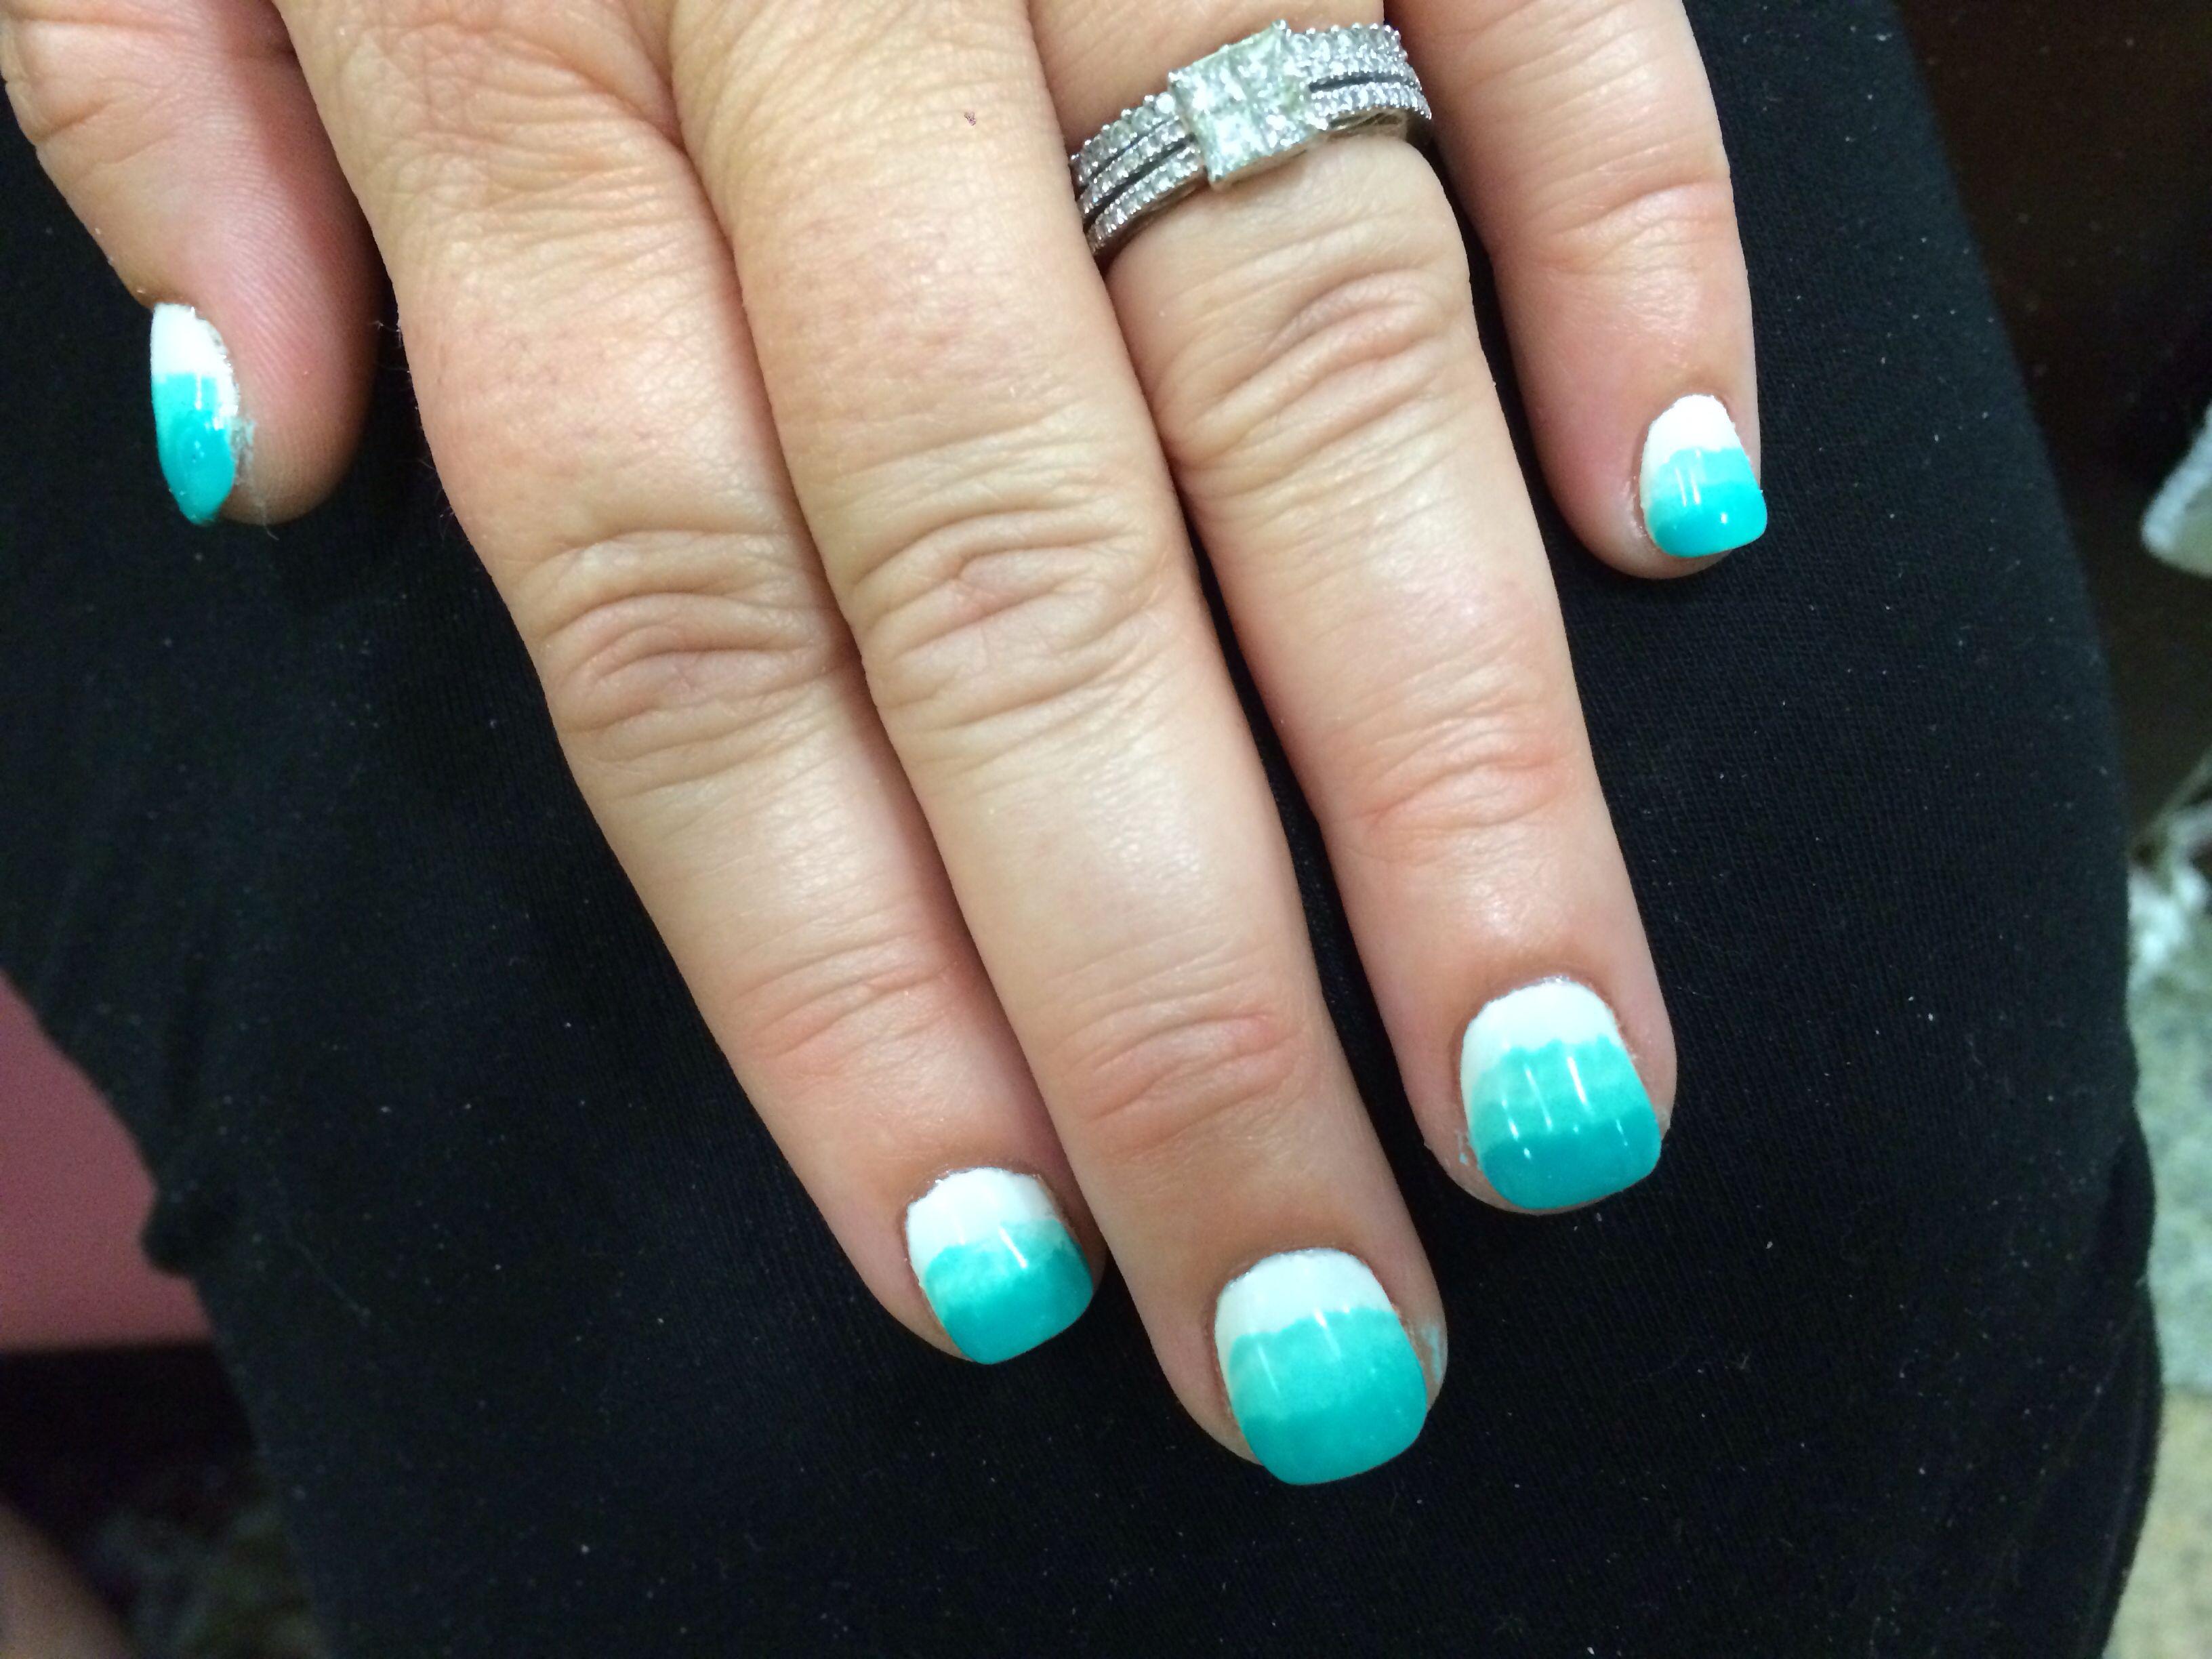 Blue gel acrylic nails #nailart #gelnails #acrylicnails #nailart ...